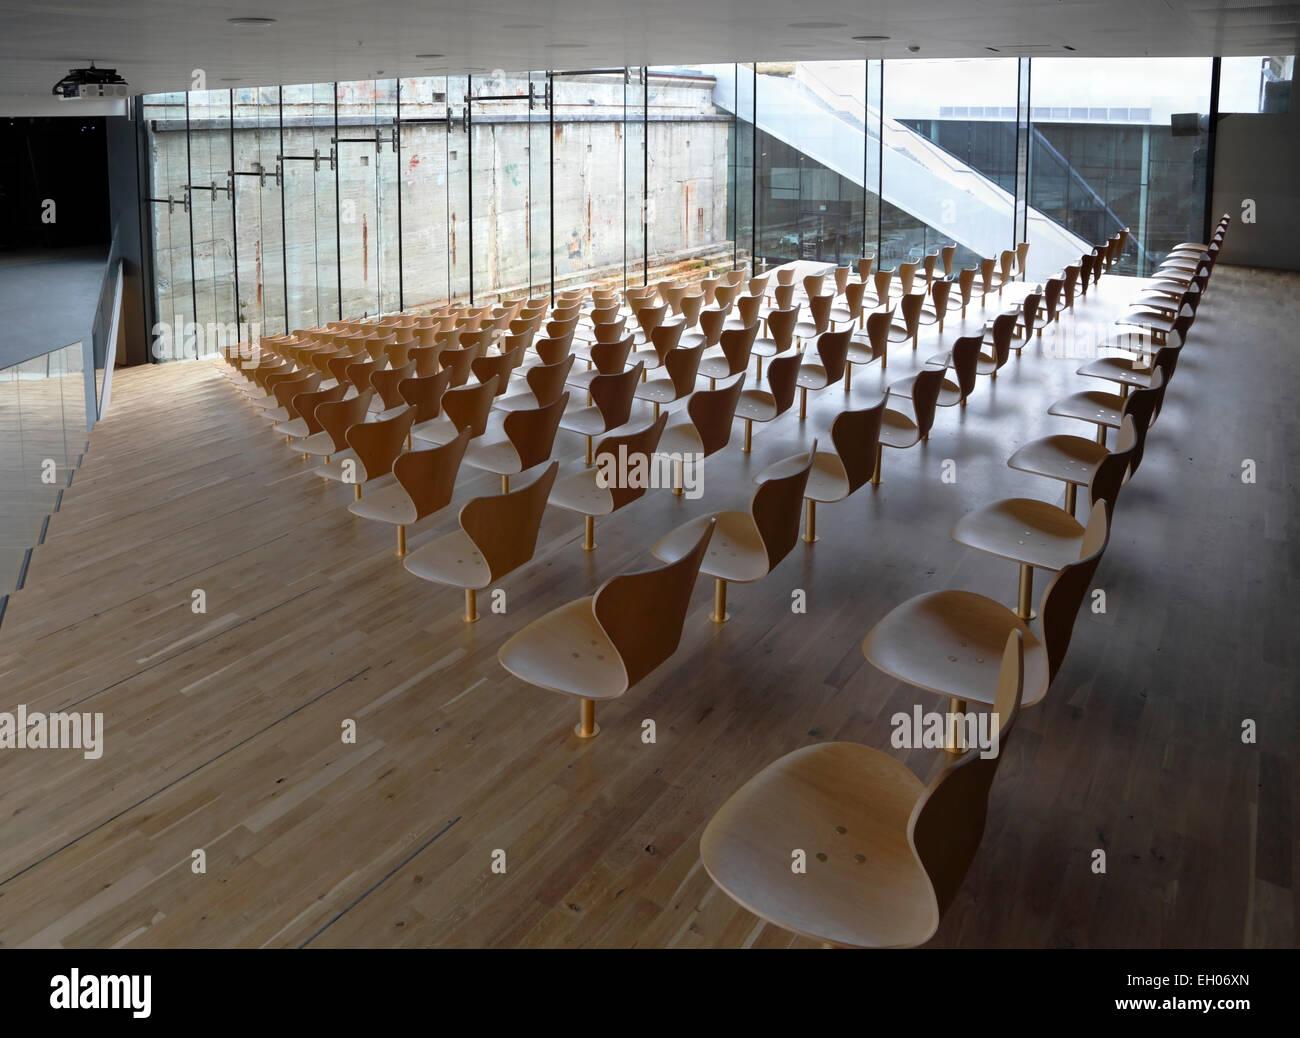 Lecture Theatre at the Maritime Museum of Denmark, M/S Museet for Søfart, Elsinore / Helsingør  Denmark. - Stock Image